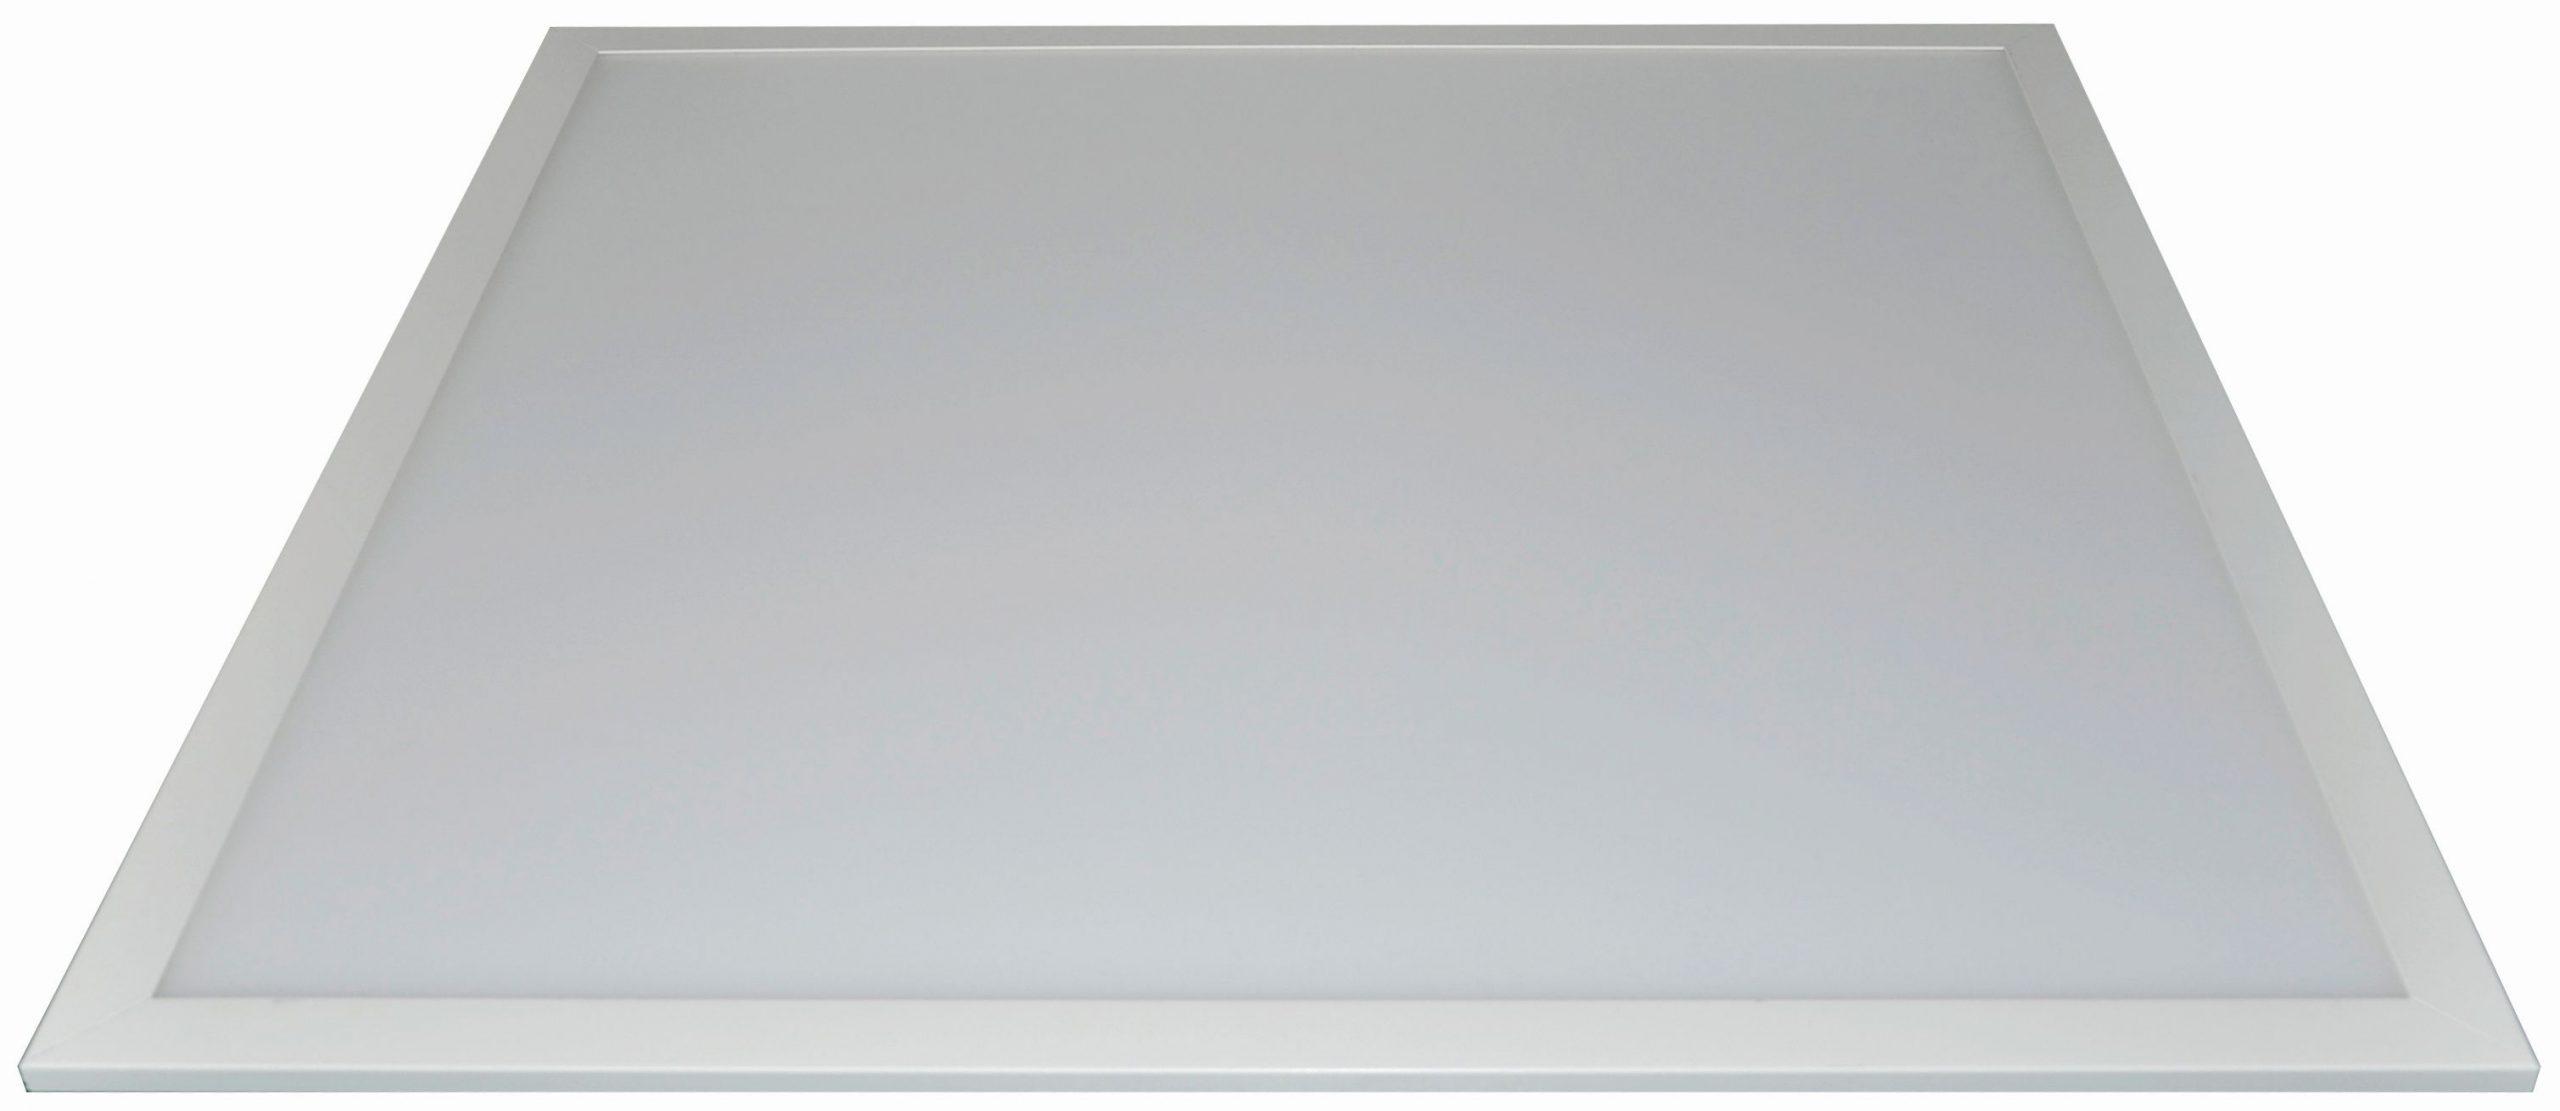 LED Panel Einlegeleuchte Modul-625 IP54 – Ausführung: UGR